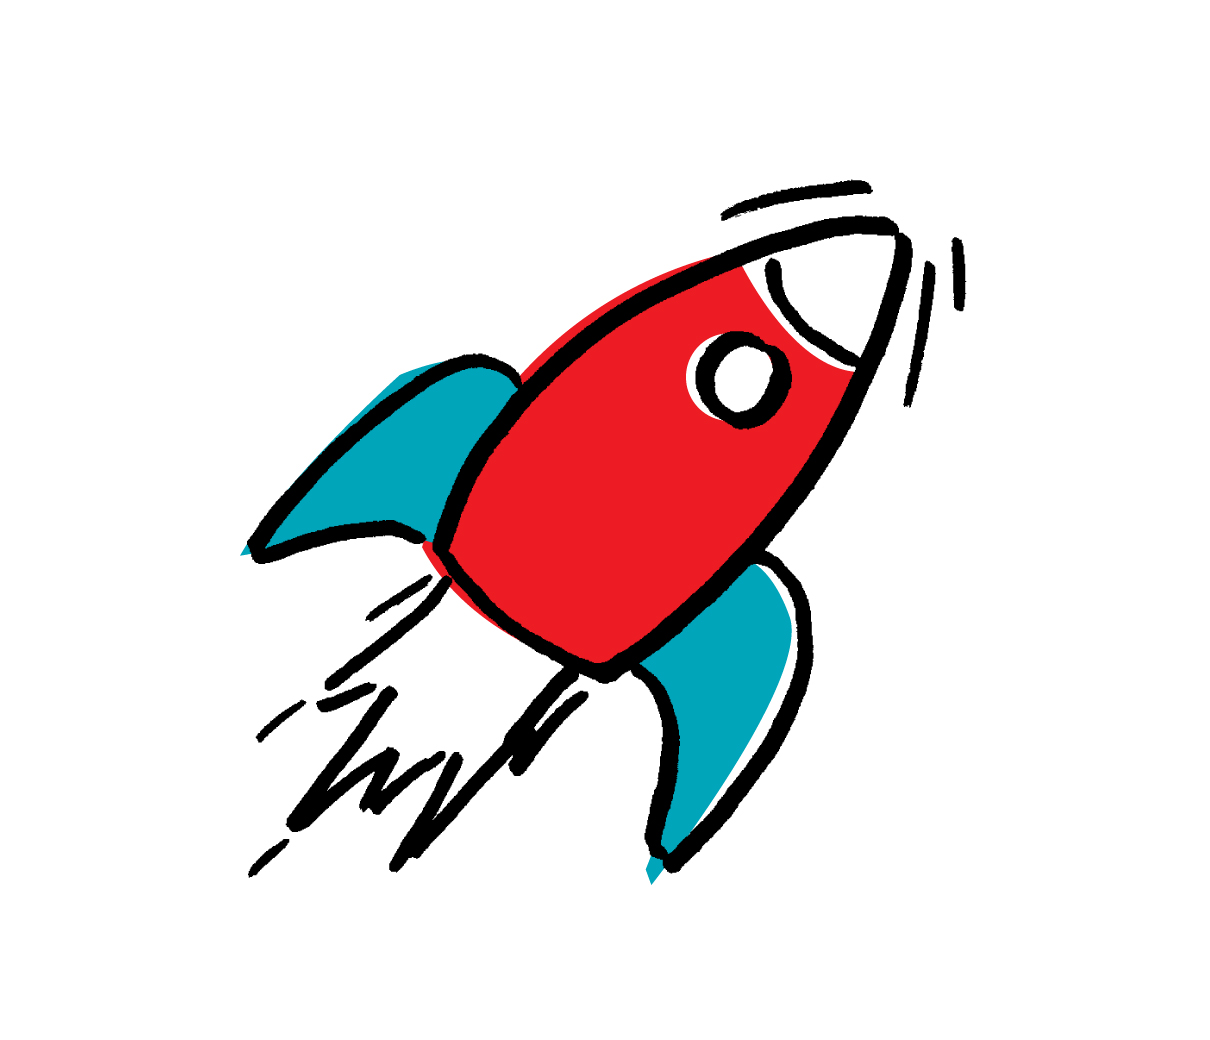 rocket-01 (2)